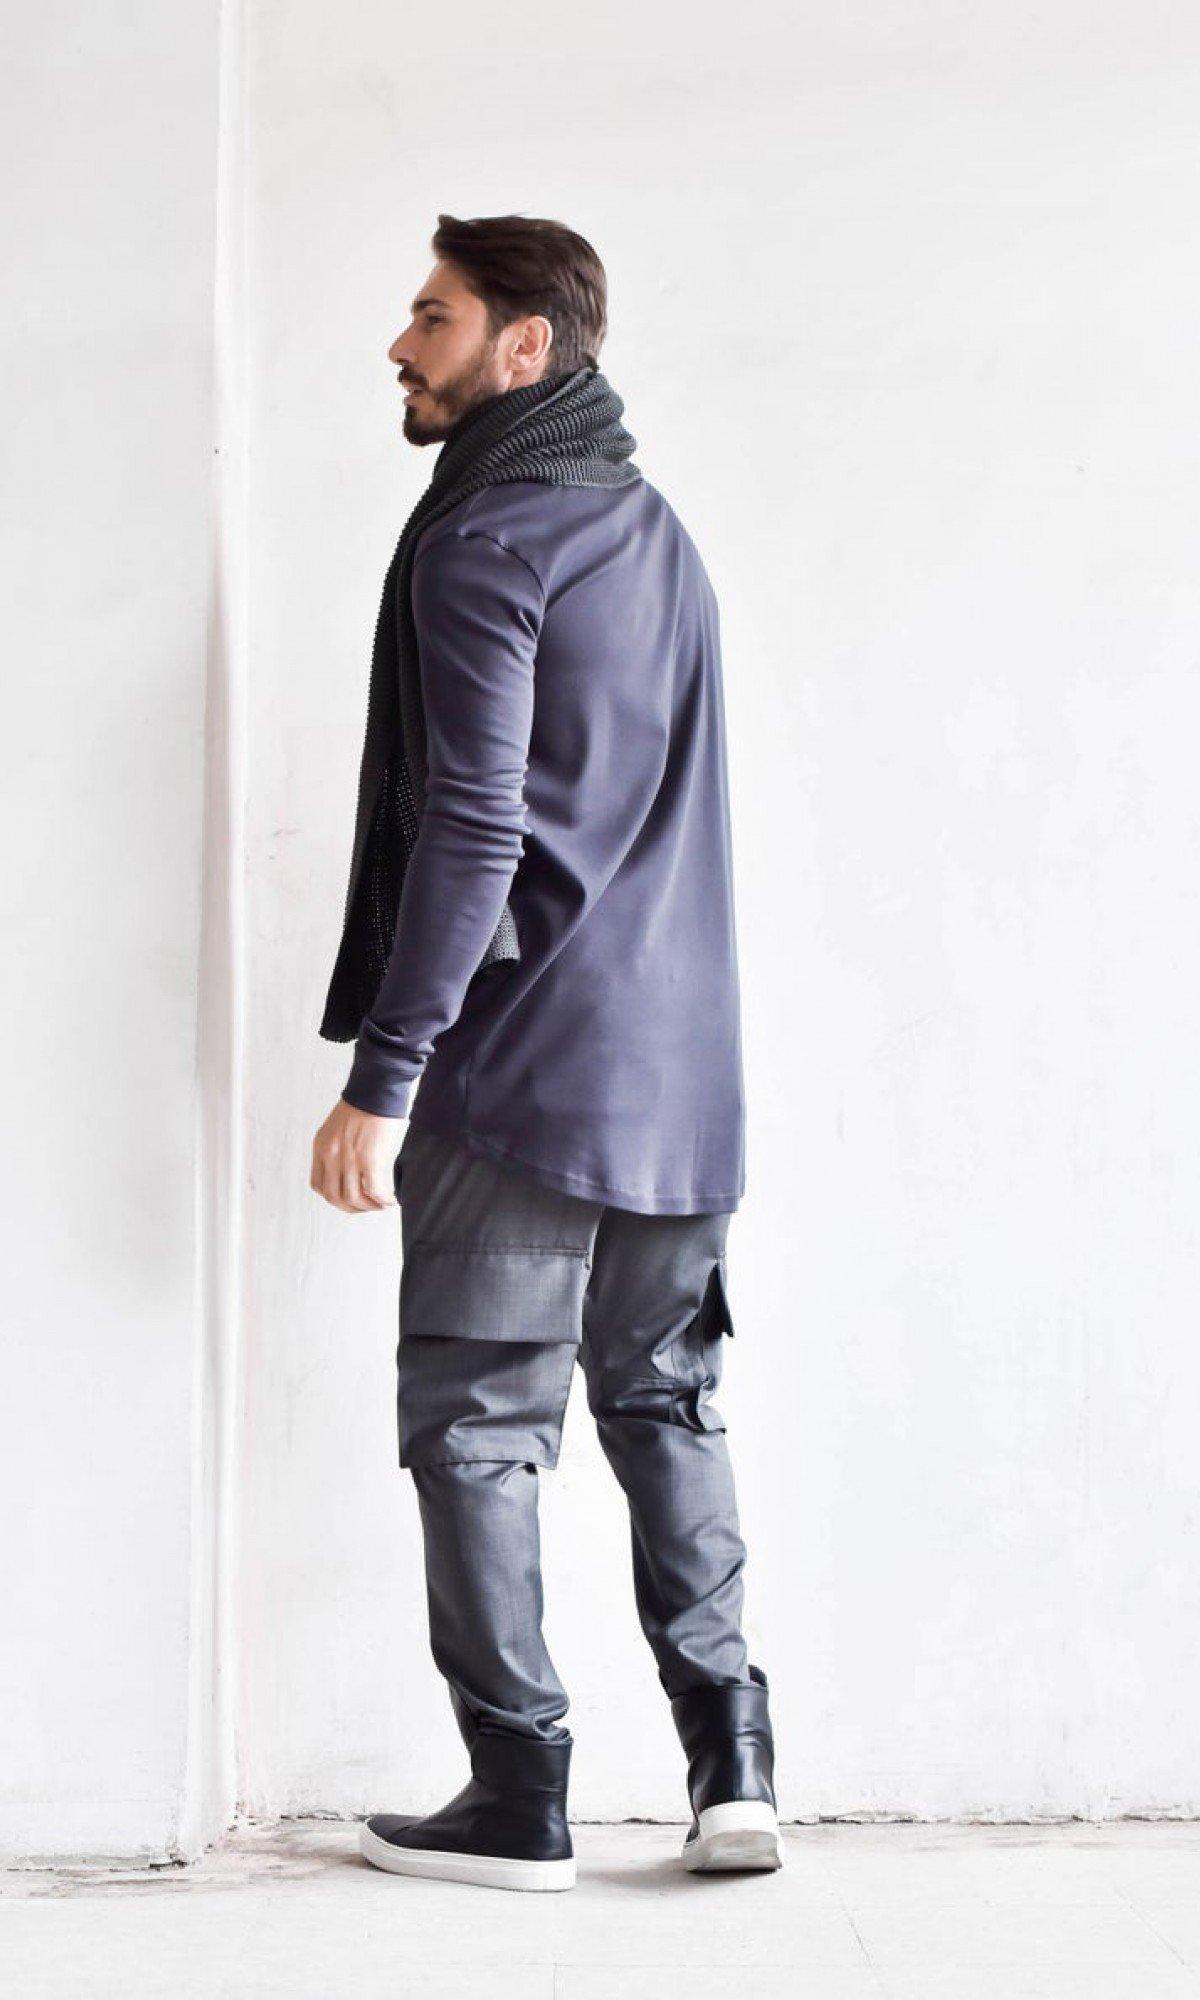 Cold Wool Black Loose Drop Crotch Pants A05262M